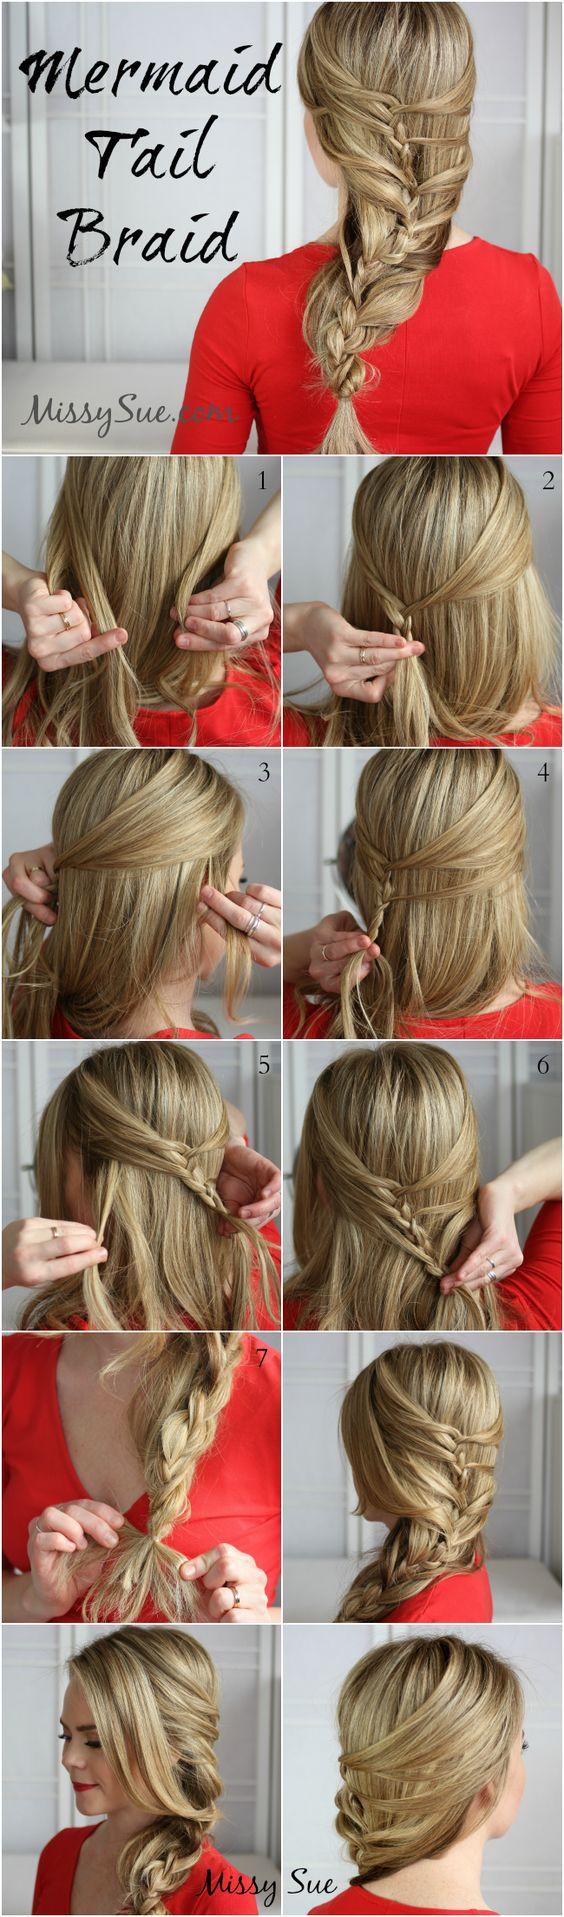 DIY Mermaid Tail Braid Hairstyle hair long hair braids diy hair hairstyles hair tutorials easy hairstyles